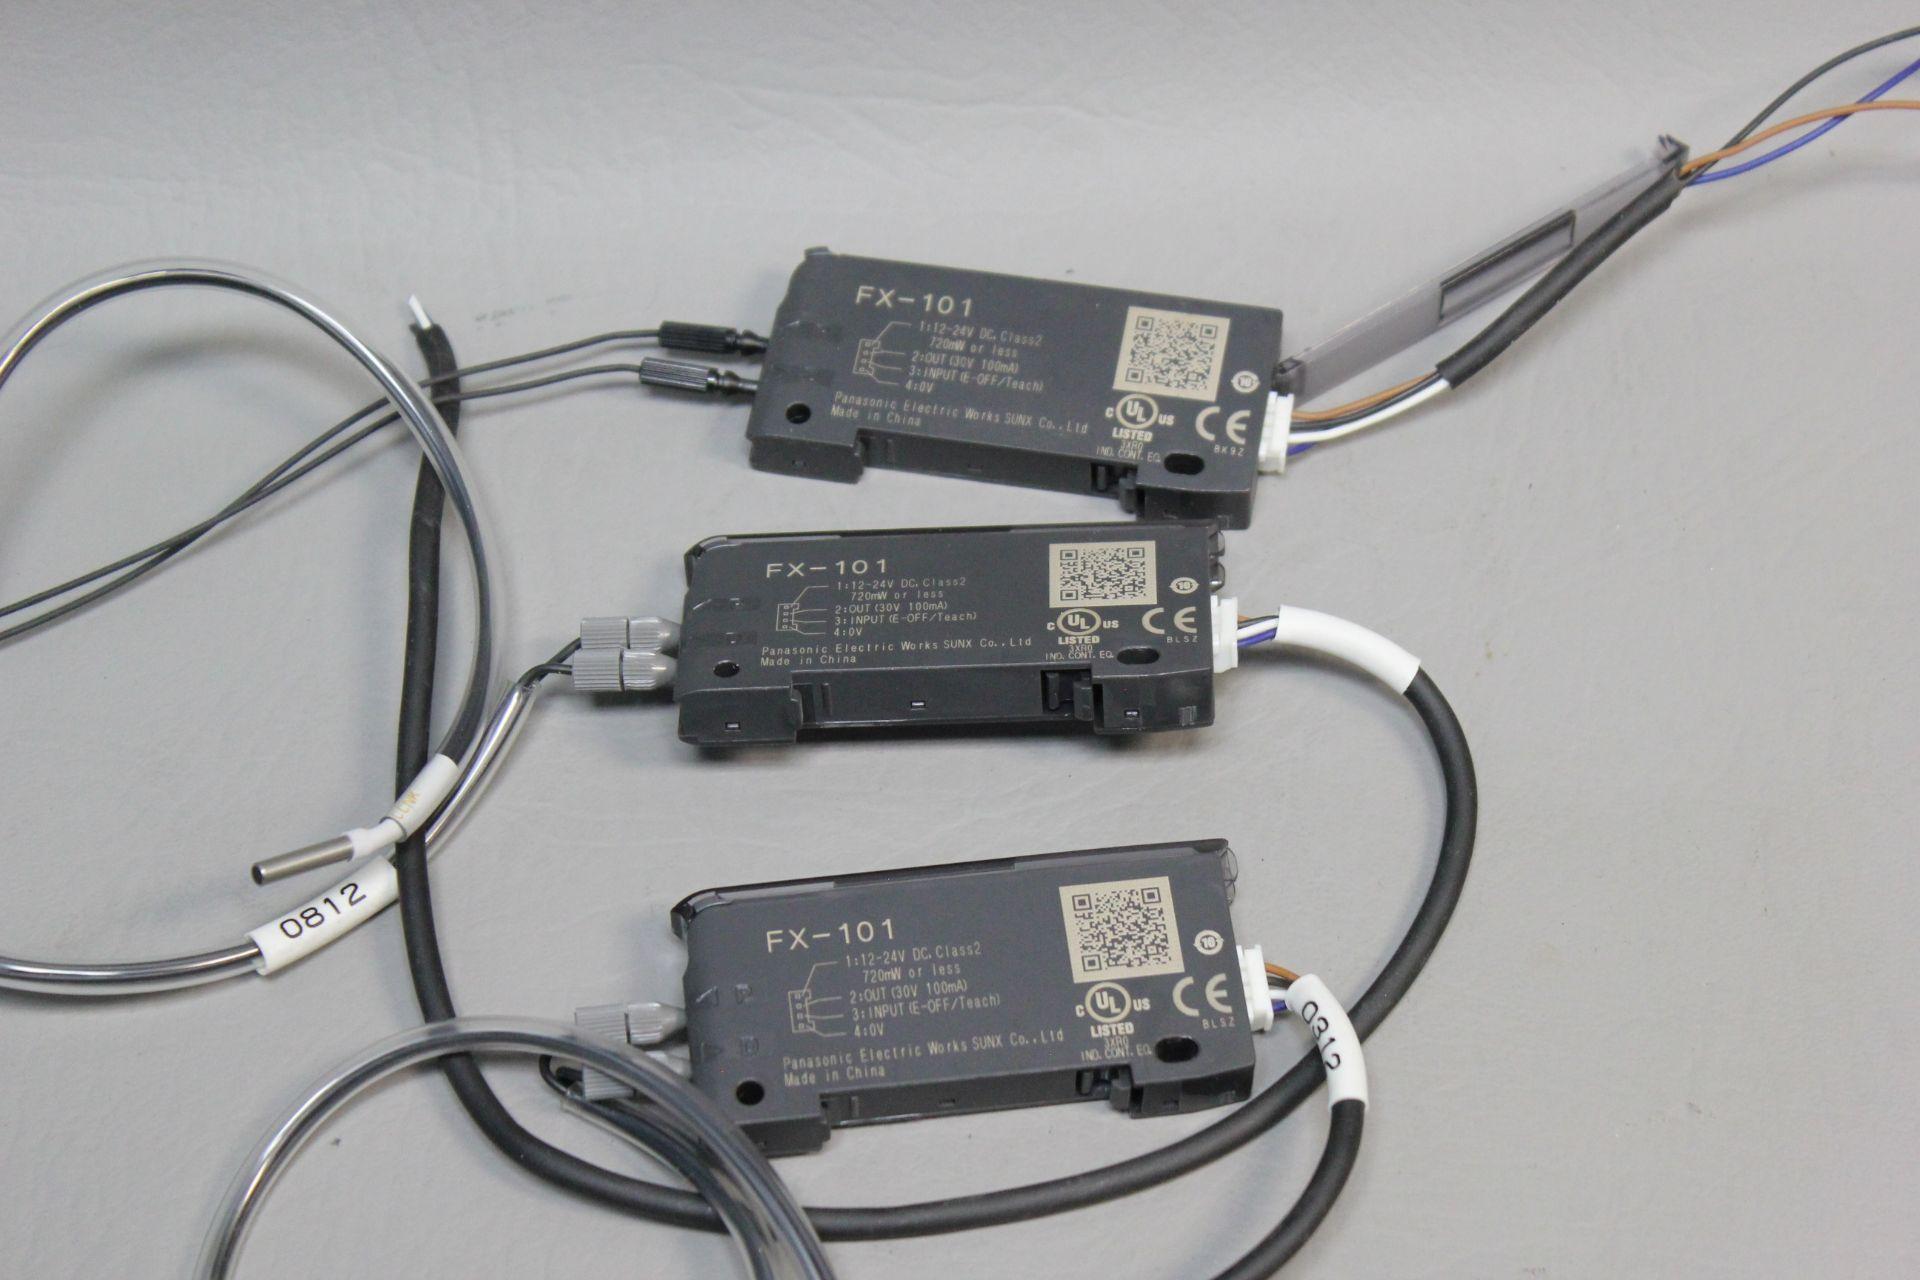 LOT OF 3 PANASONIC DIGITAL FIBER OPTIC SENSORS